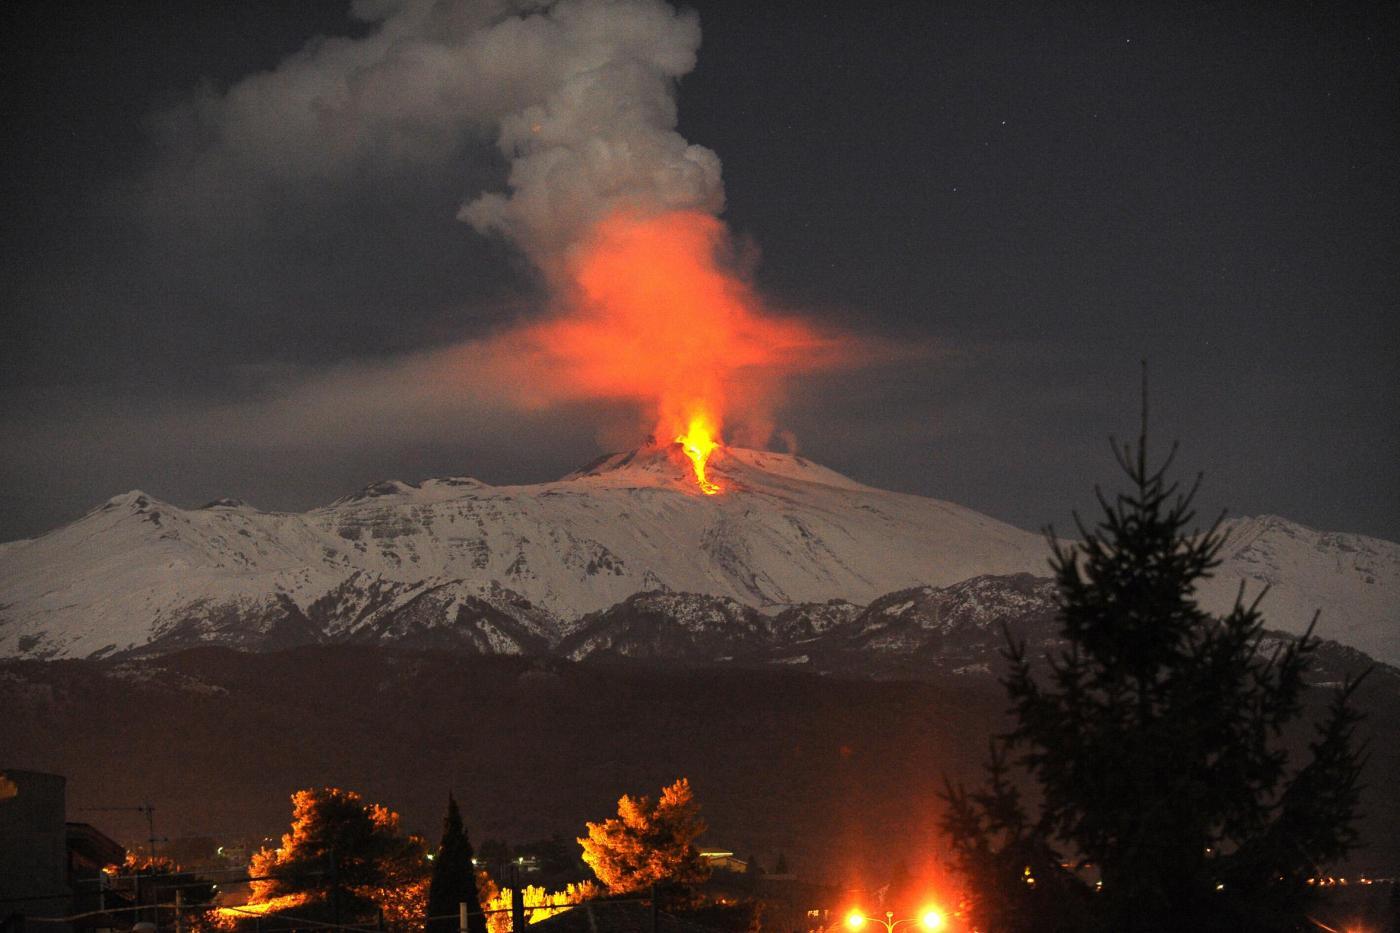 Etna, nuova eruzione dal cratere di Sud/Est$